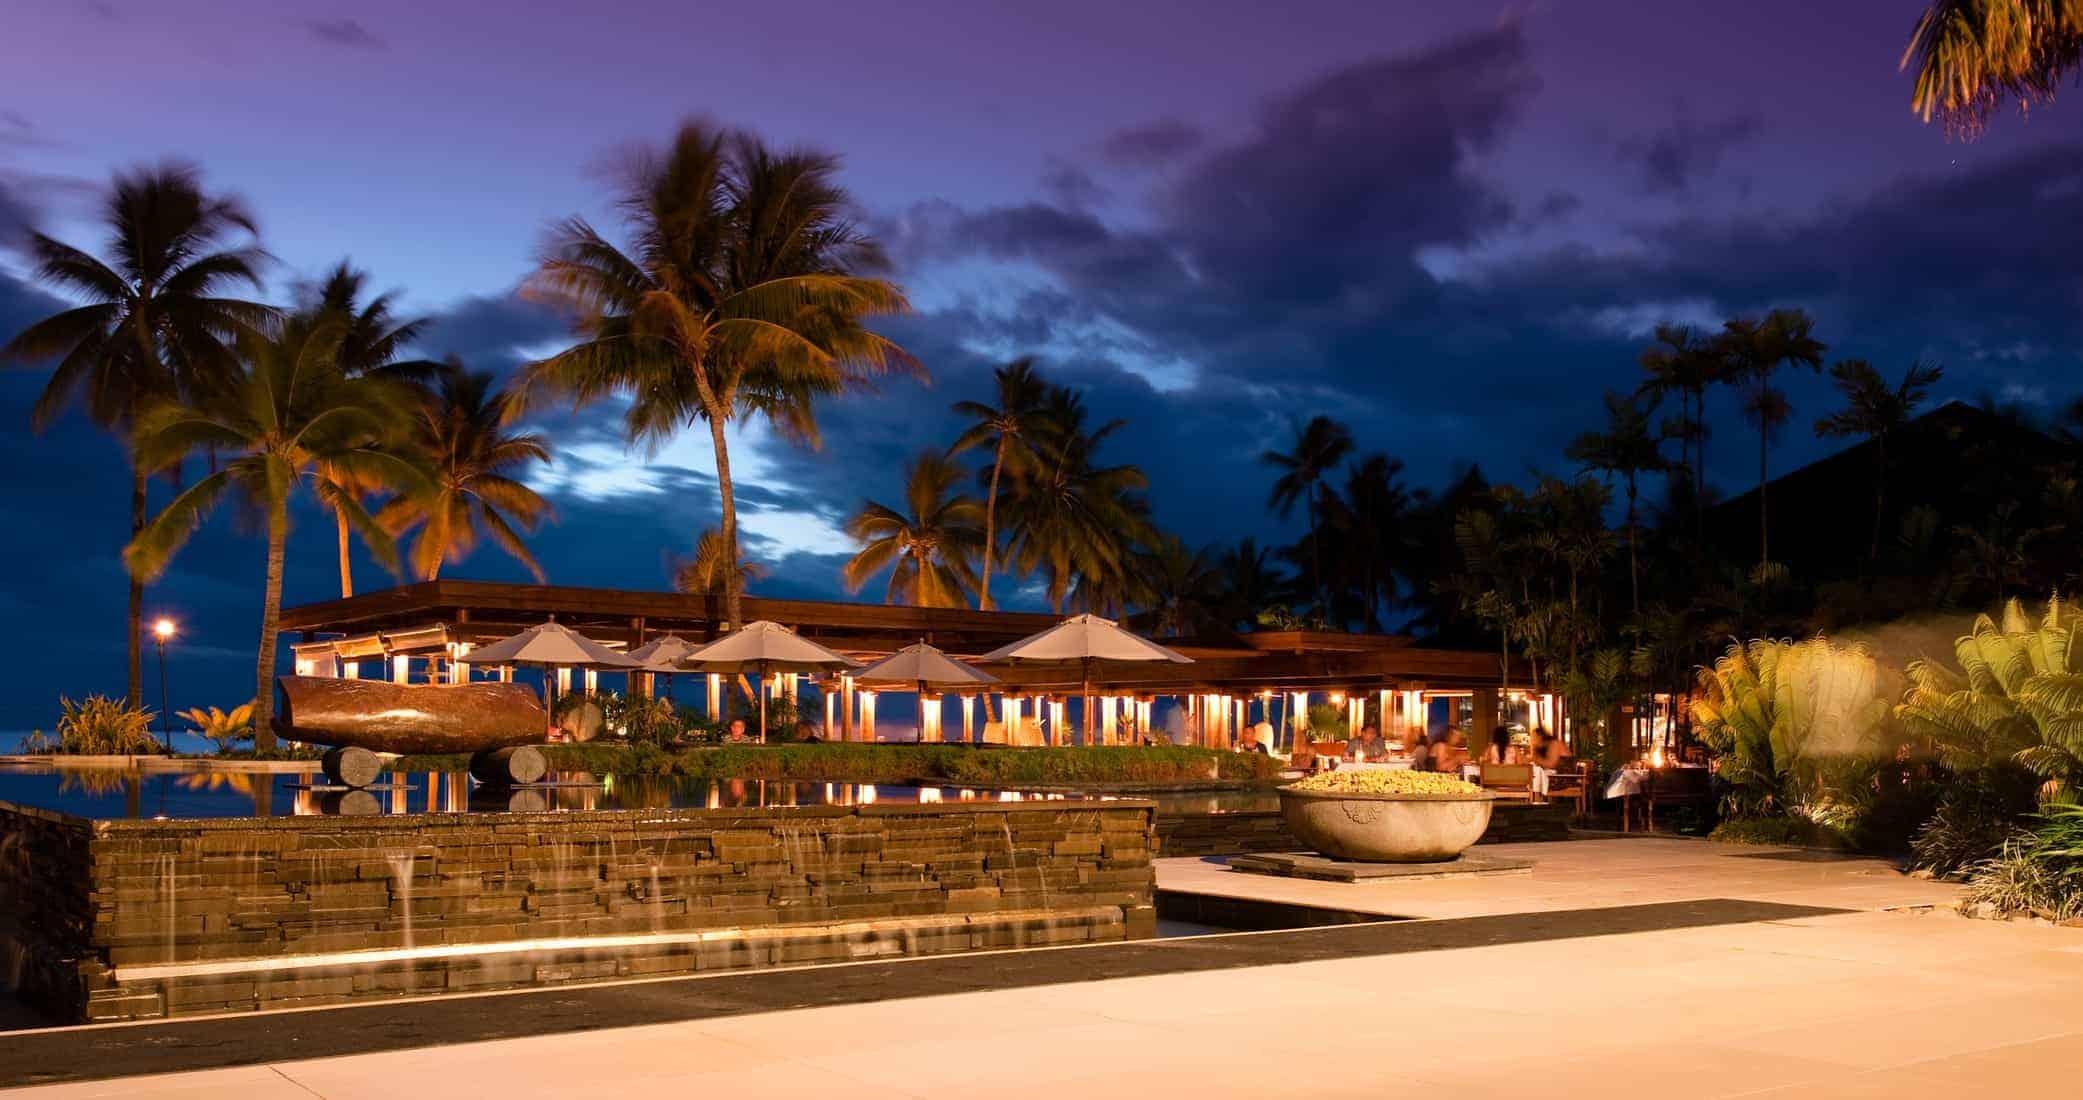 Fiji resort sunset